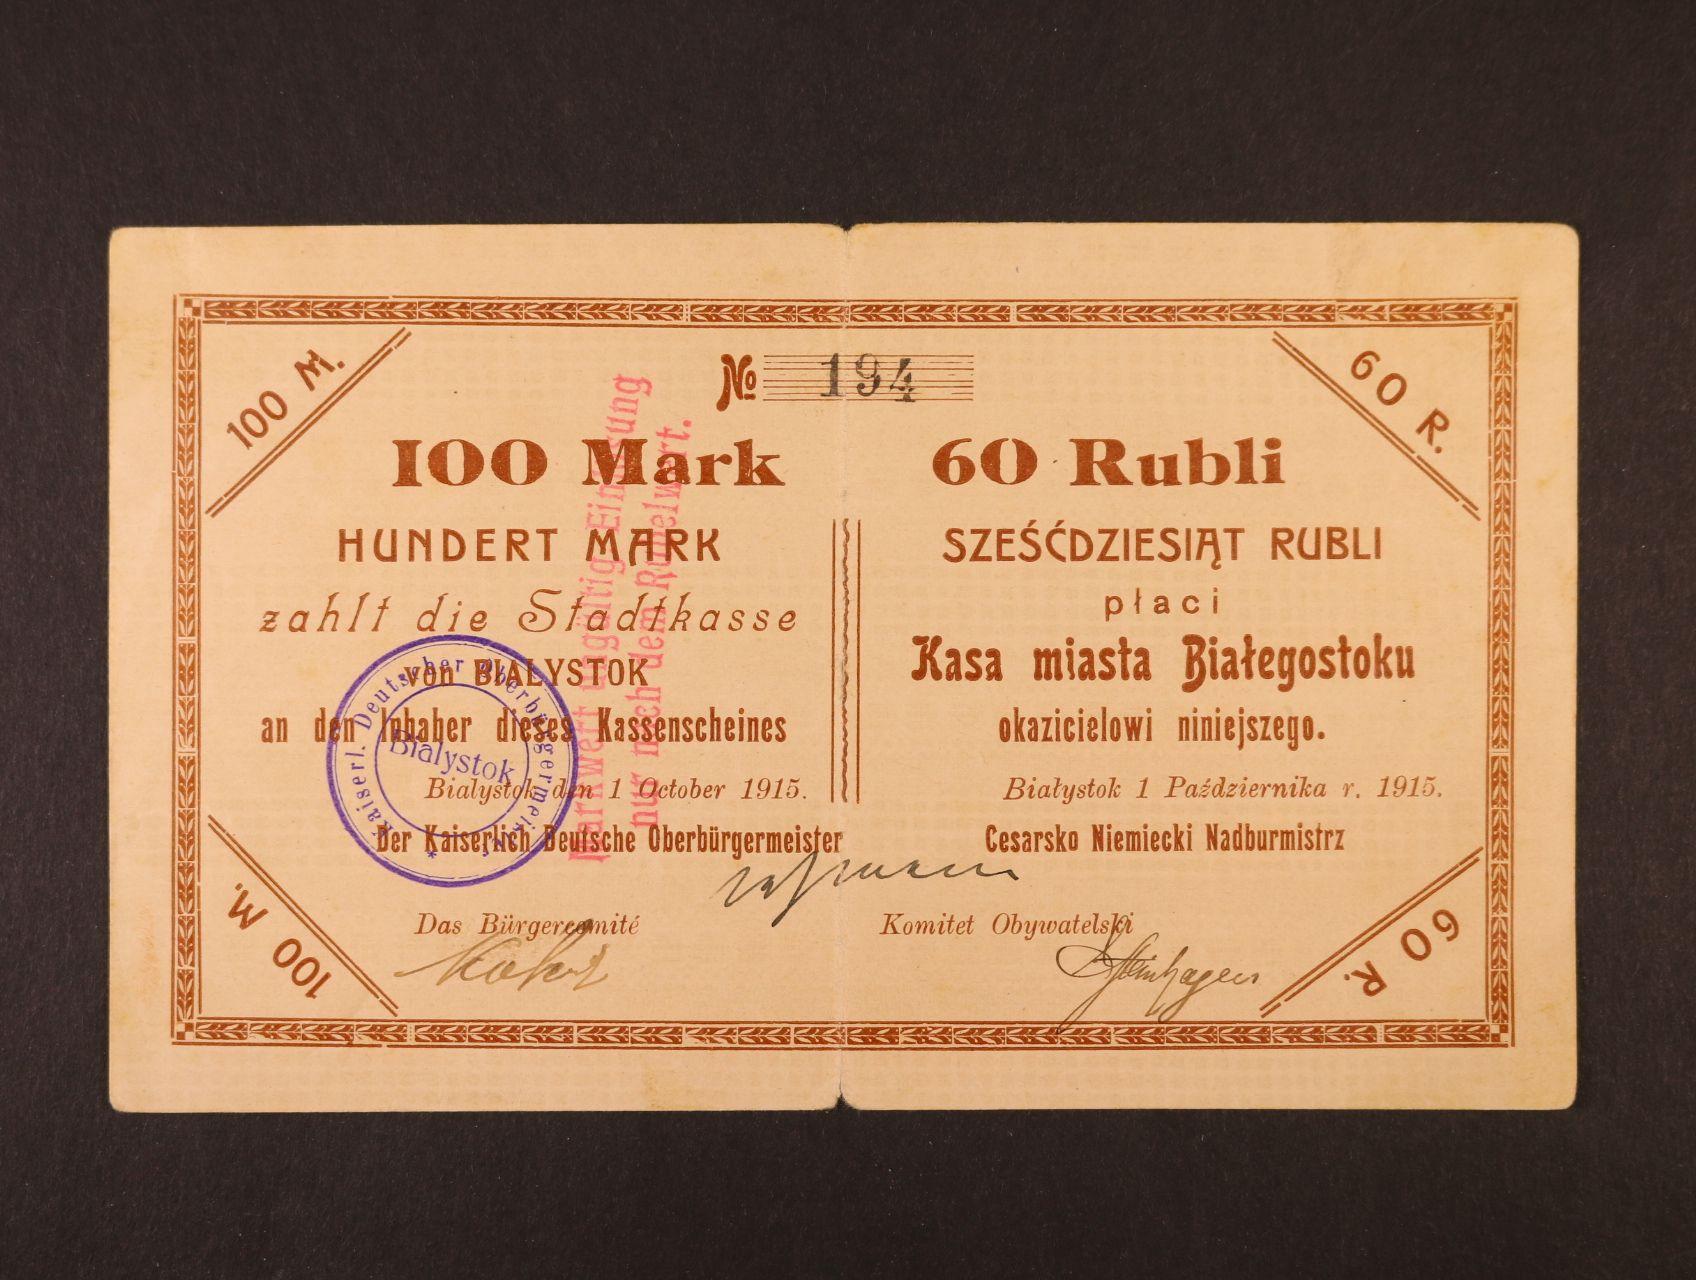 Belostok, 100 Mark = 60 Rubli 1915 City Government, Rj. R-26680